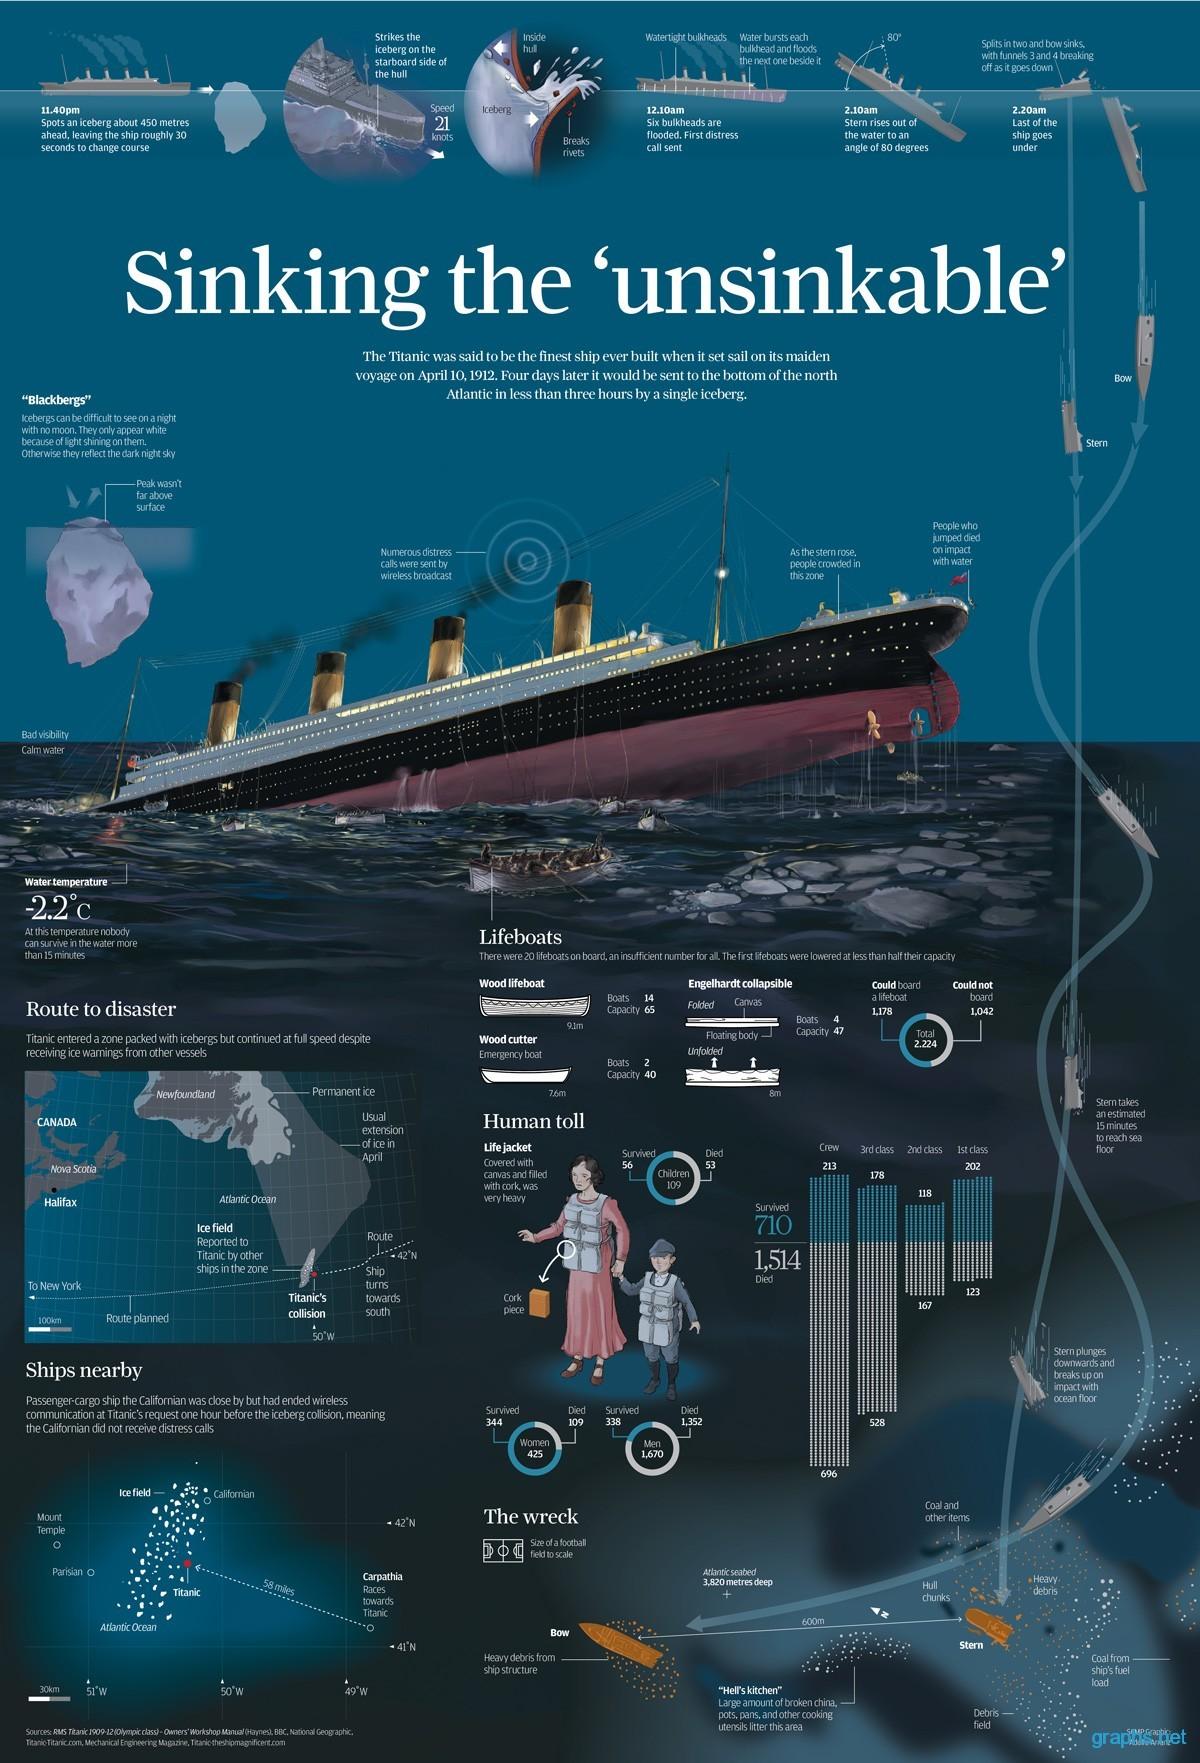 Titanic: Sinking the Unsinkable